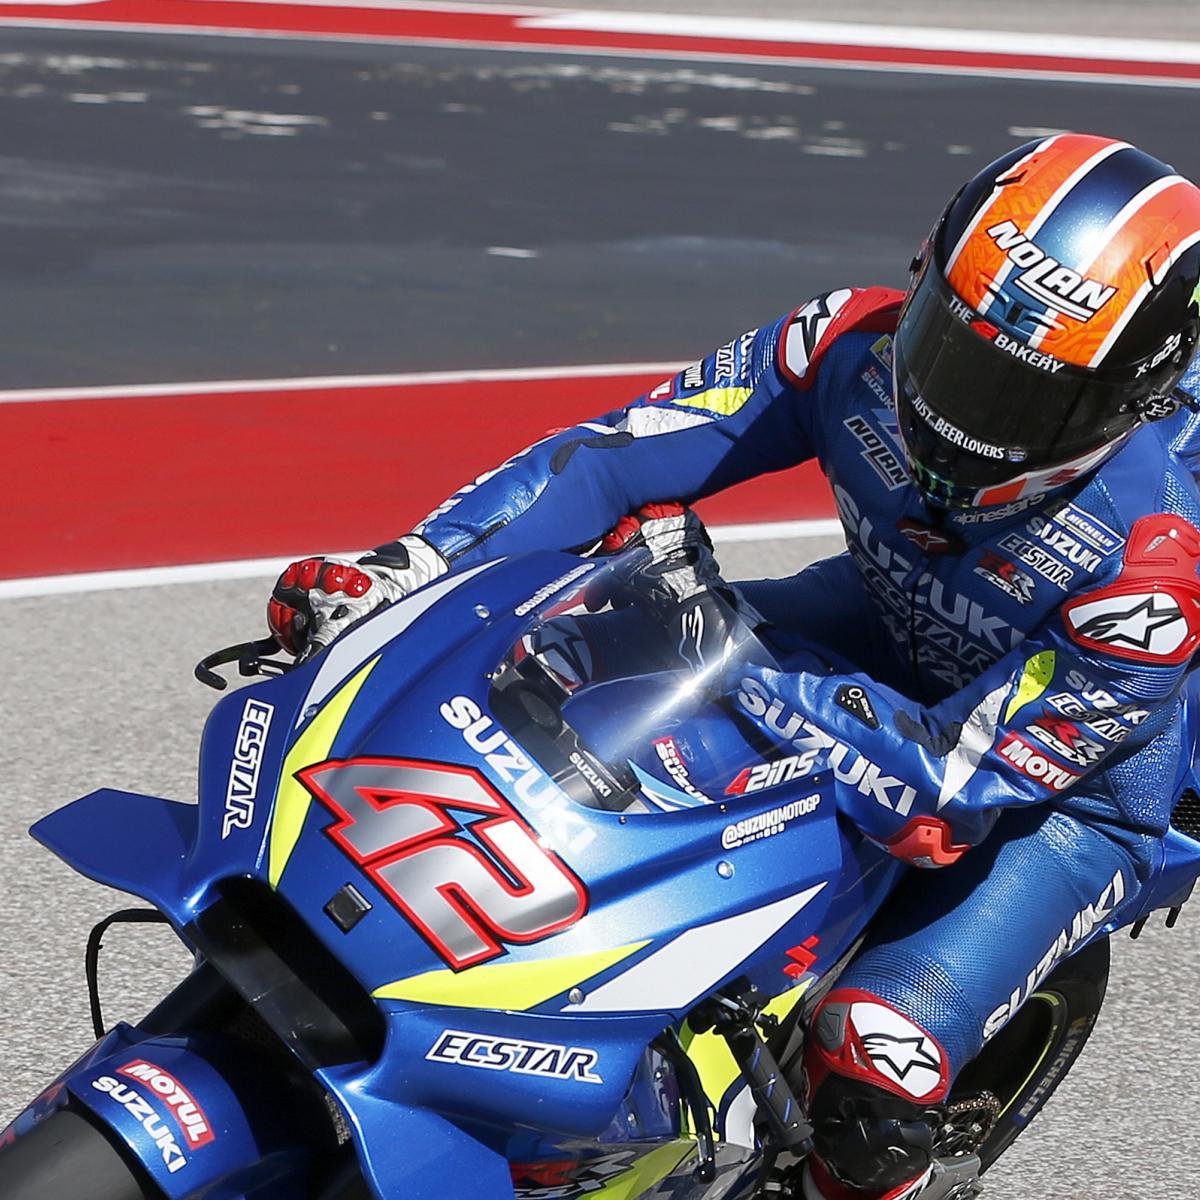 MotoGP Grand Prix of Americas 2019 Results: Alex Rins Secures 1st Career Win | Bleacher Report ...